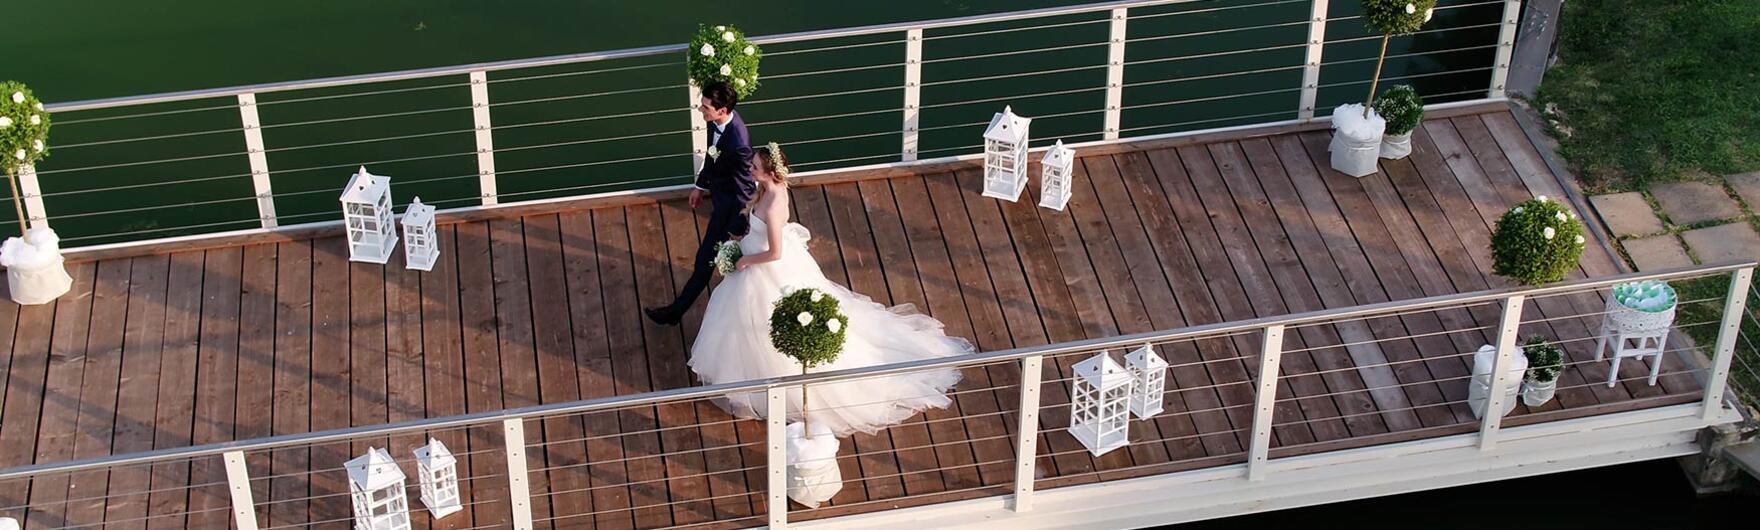 cadelfacco en wedding-location-lombardy 012